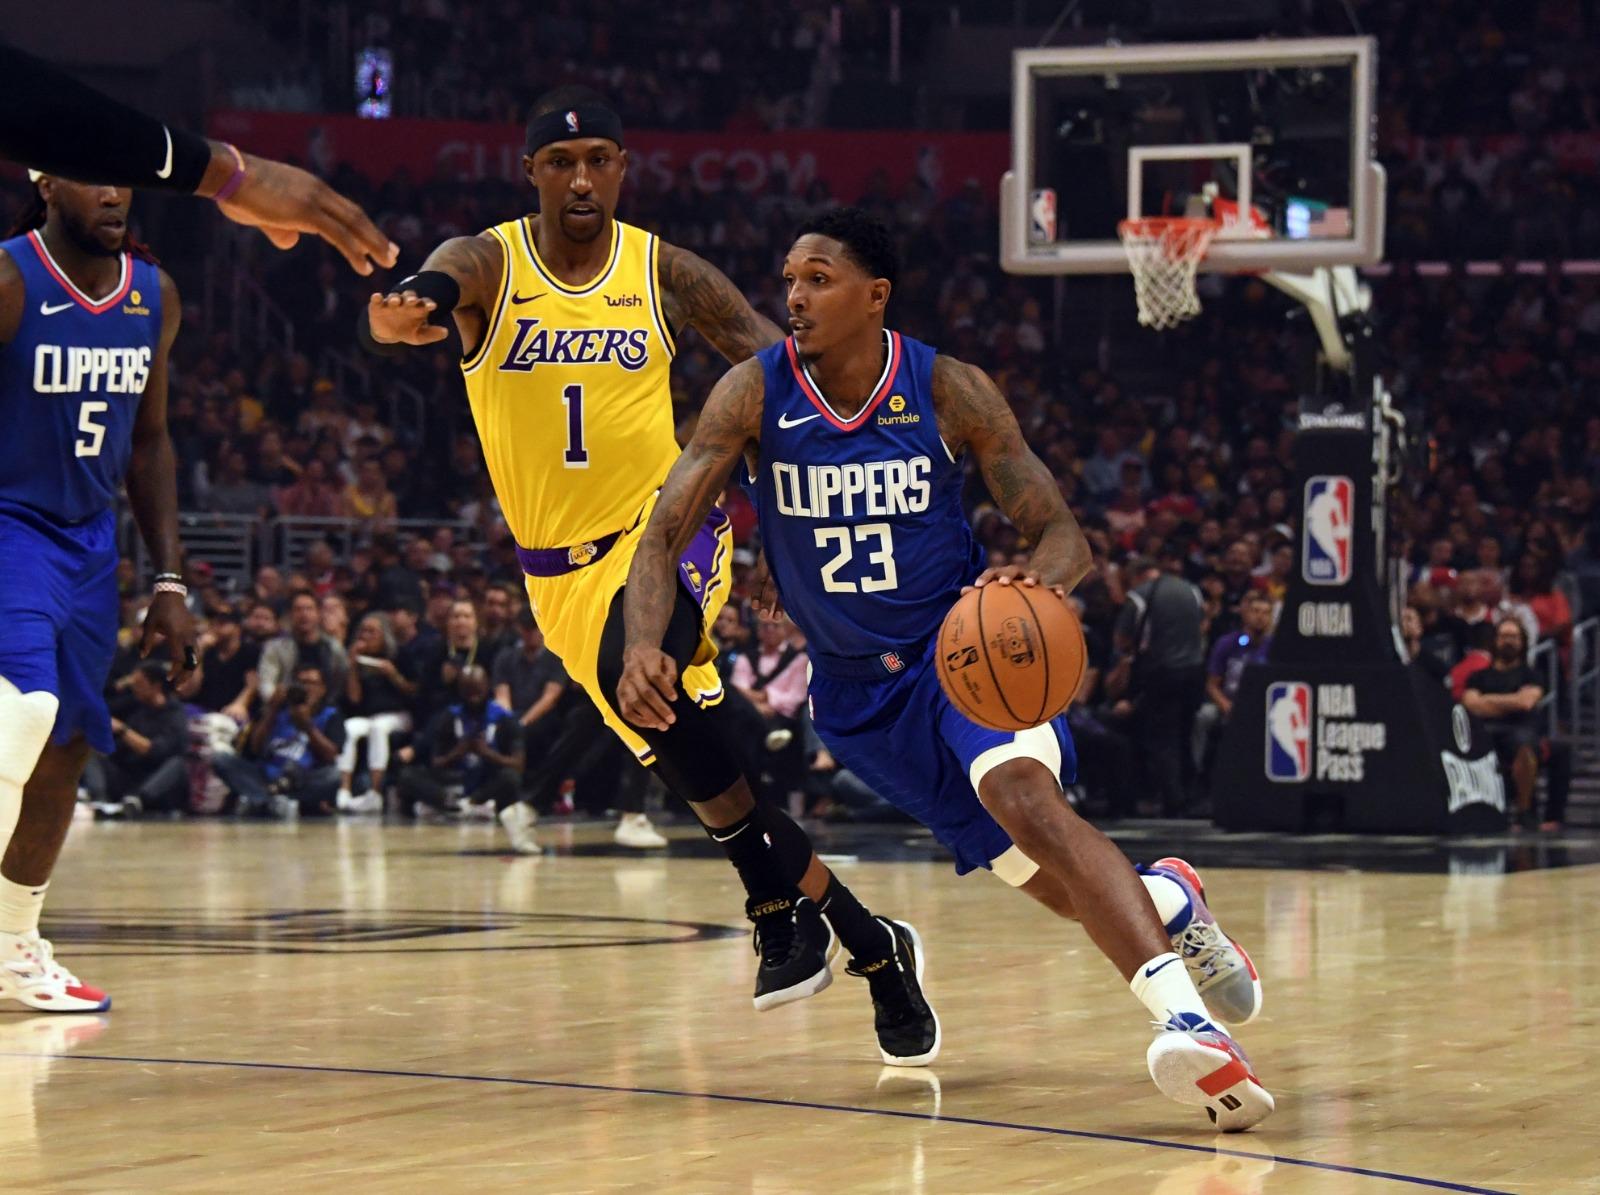 Los Angeles derbisi Clippers'ın